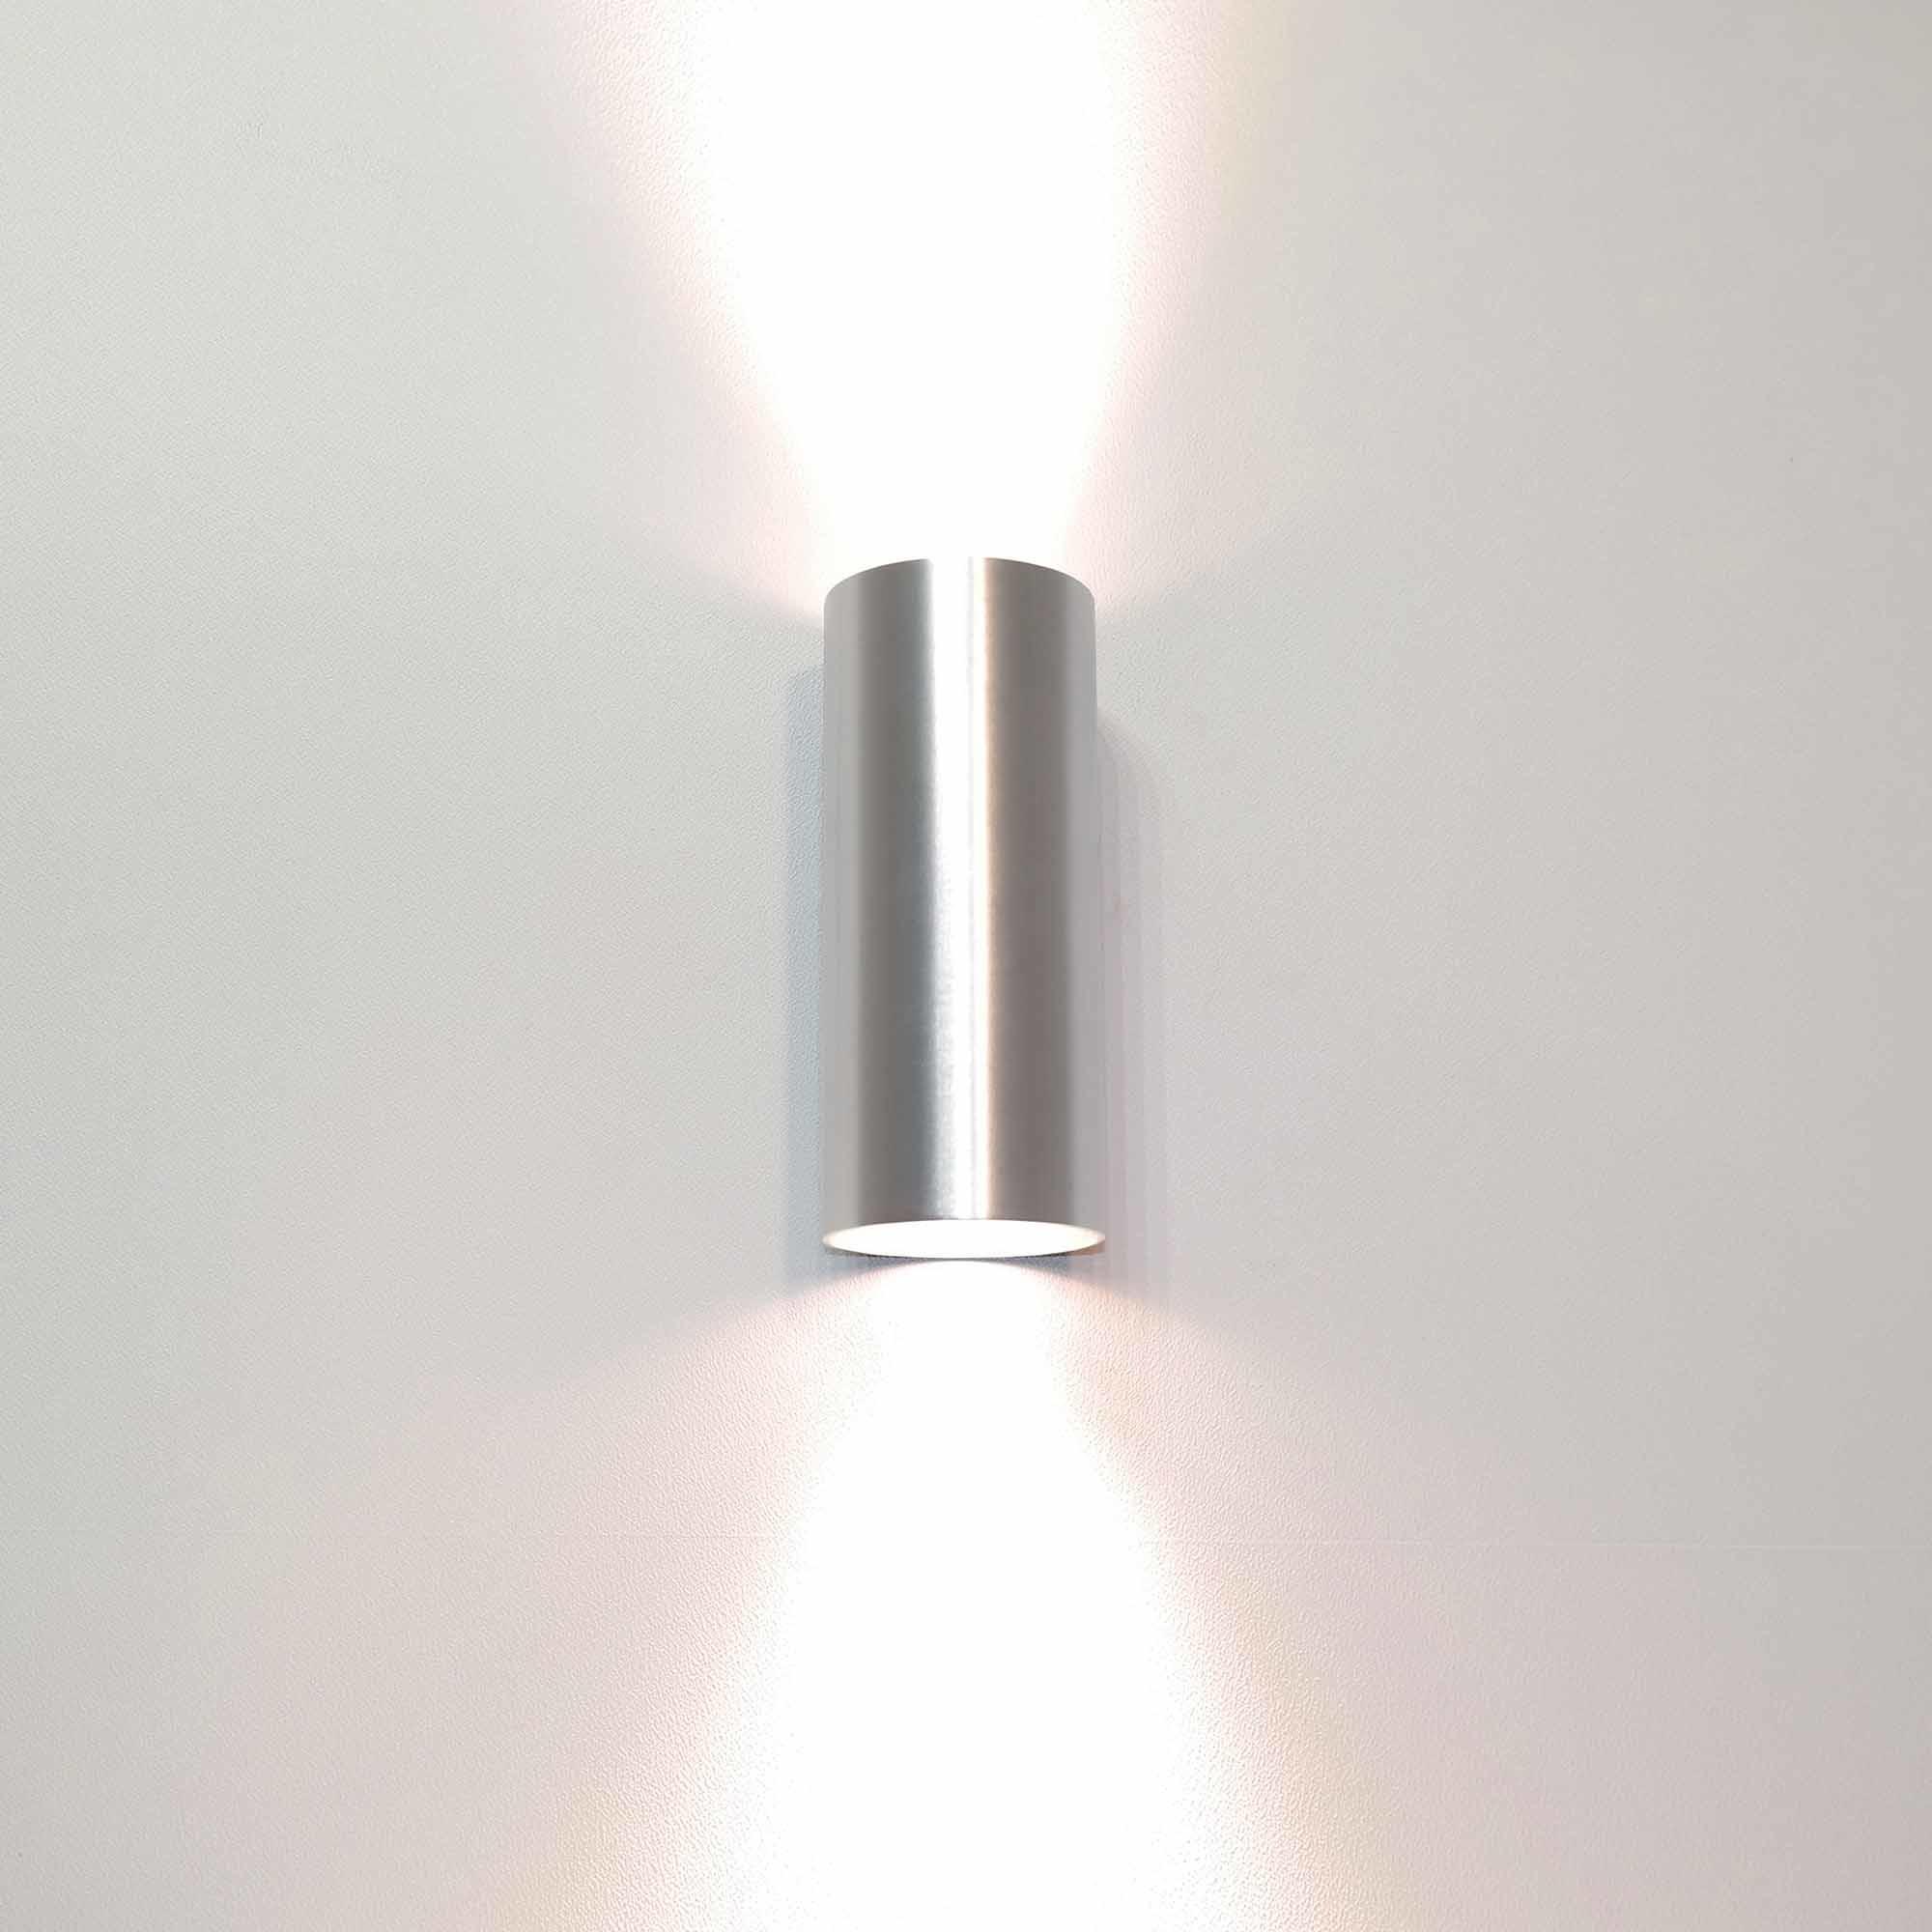 Artdelight Wandlamp Roulo 2 lichts H 15,4 Ø 6,5 cm aluminium